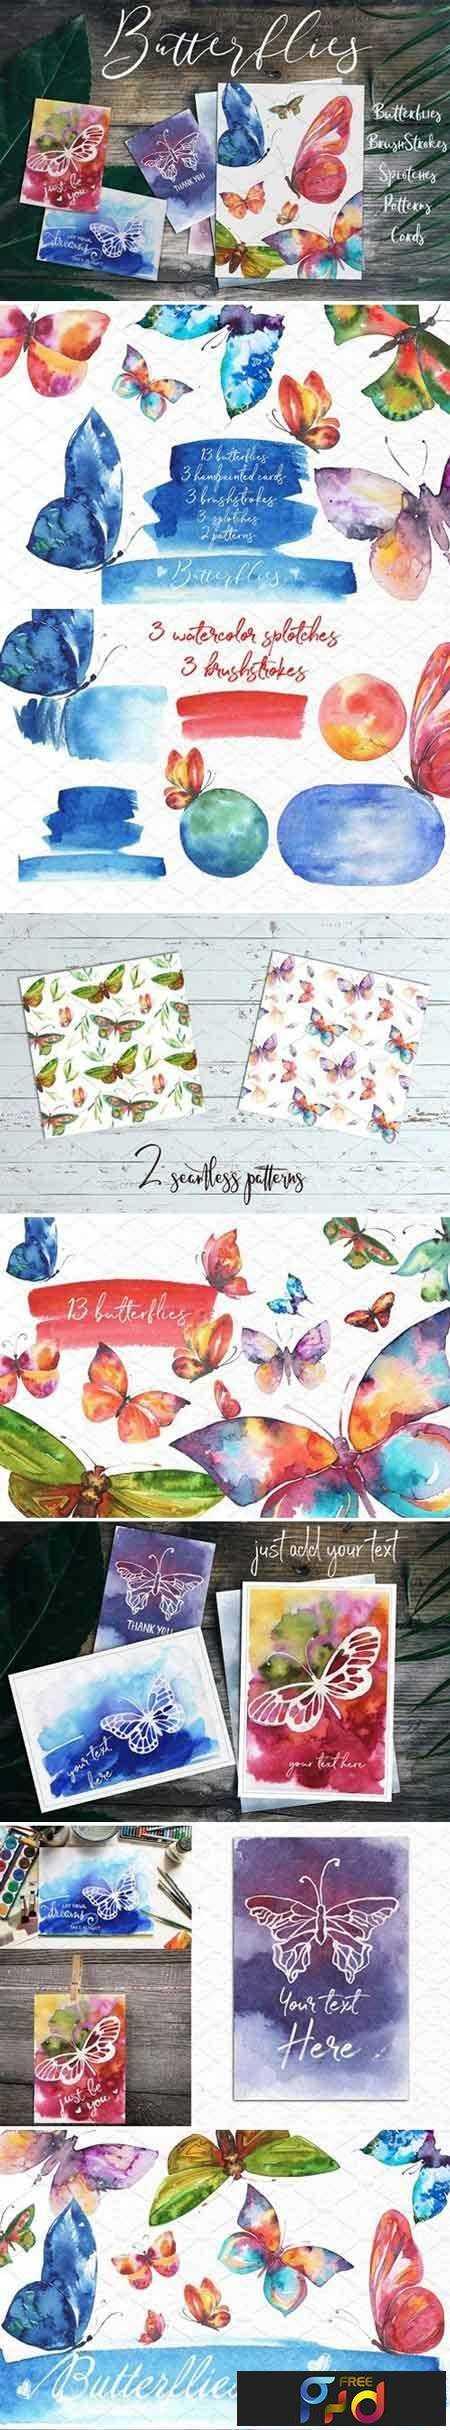 1709099 Butterflies Watercolor Set 2083869 1